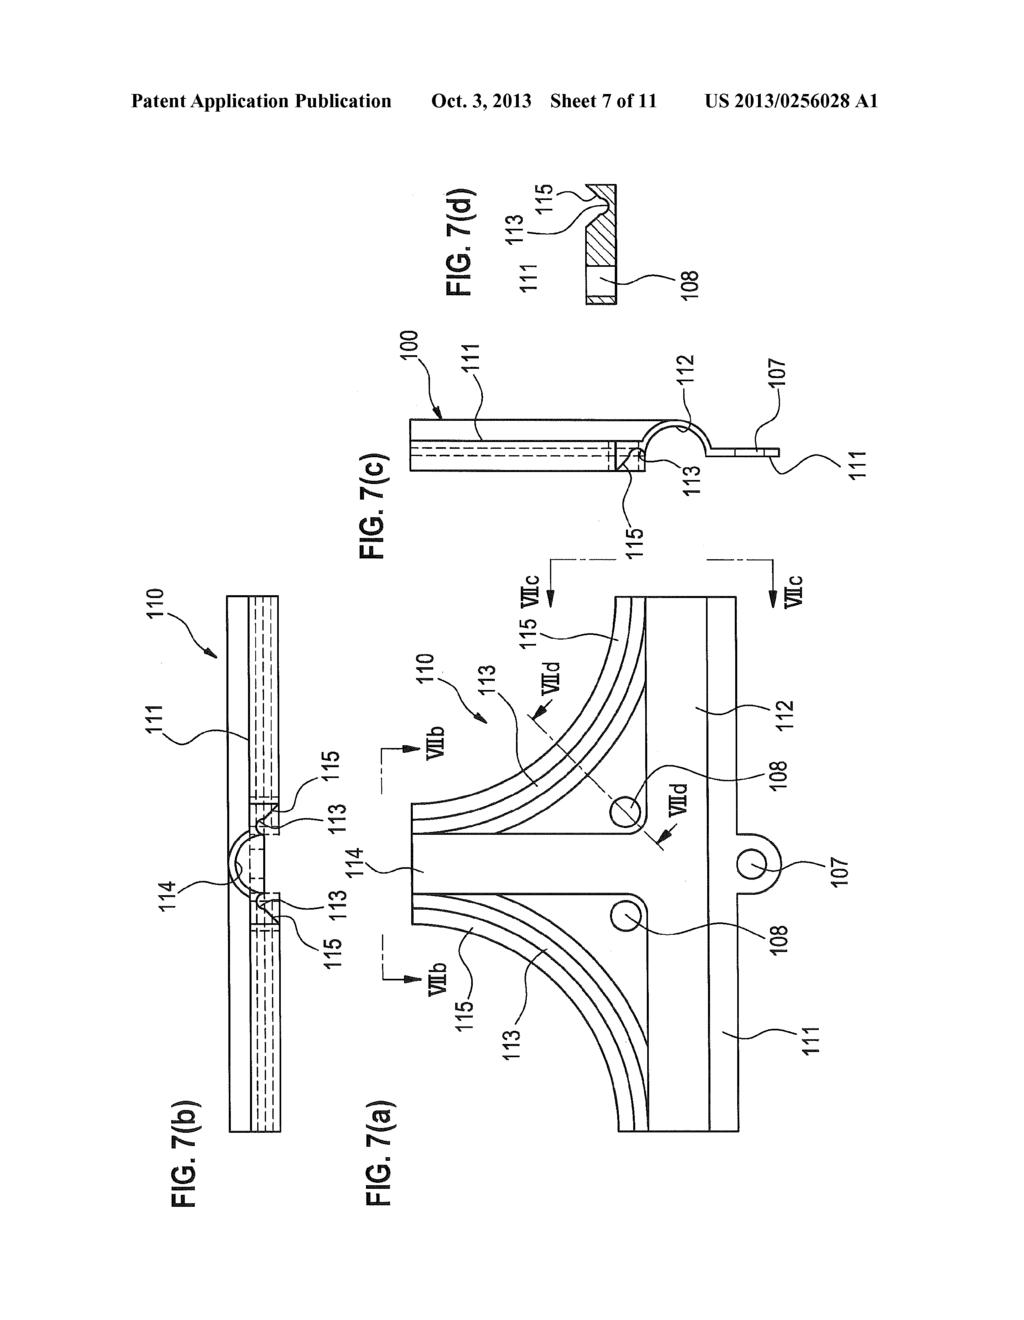 coleman evcon wiring diagram thermostat vmware basic dgat070bdd furnace mach